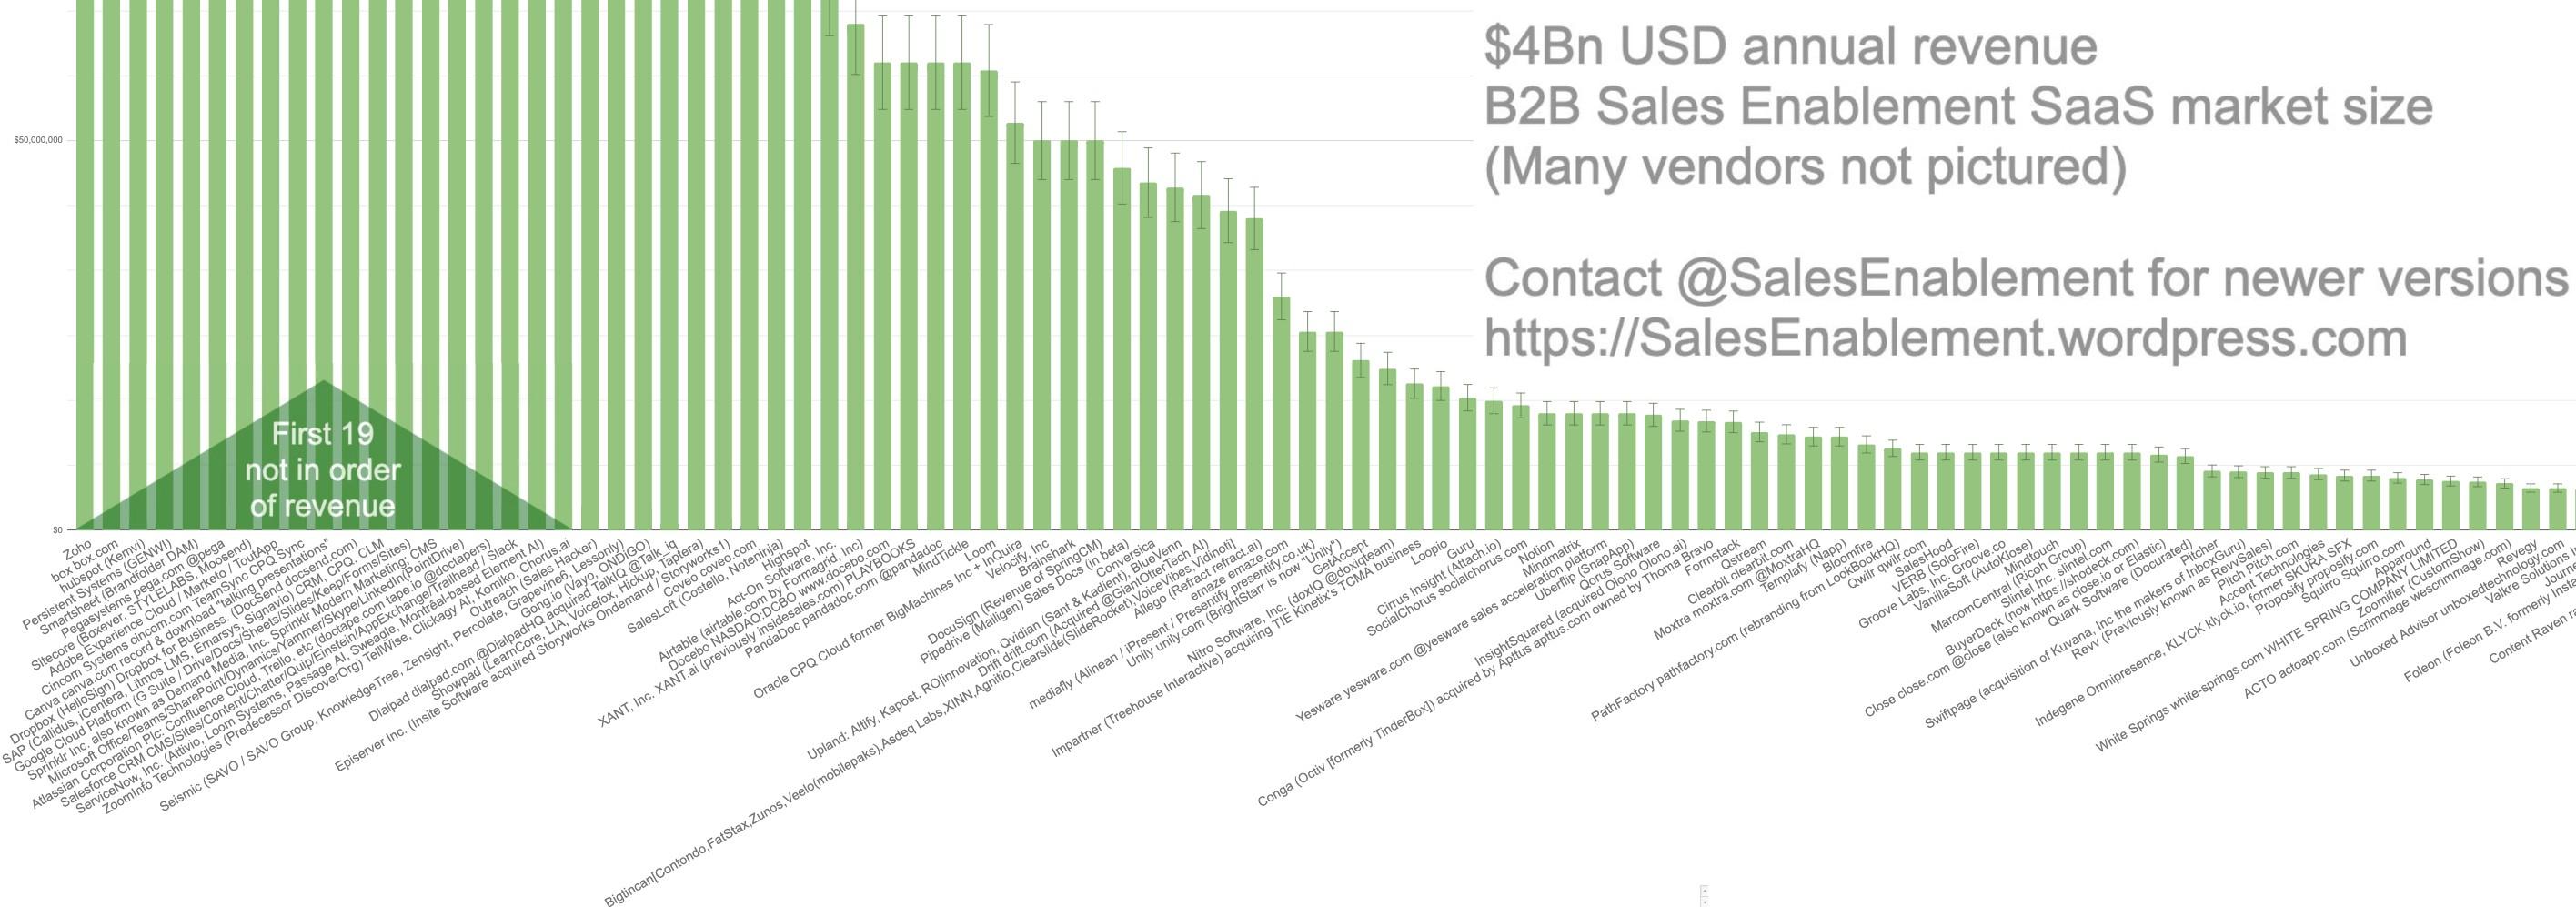 sales_enablement_saas_market_22-AUG_2021